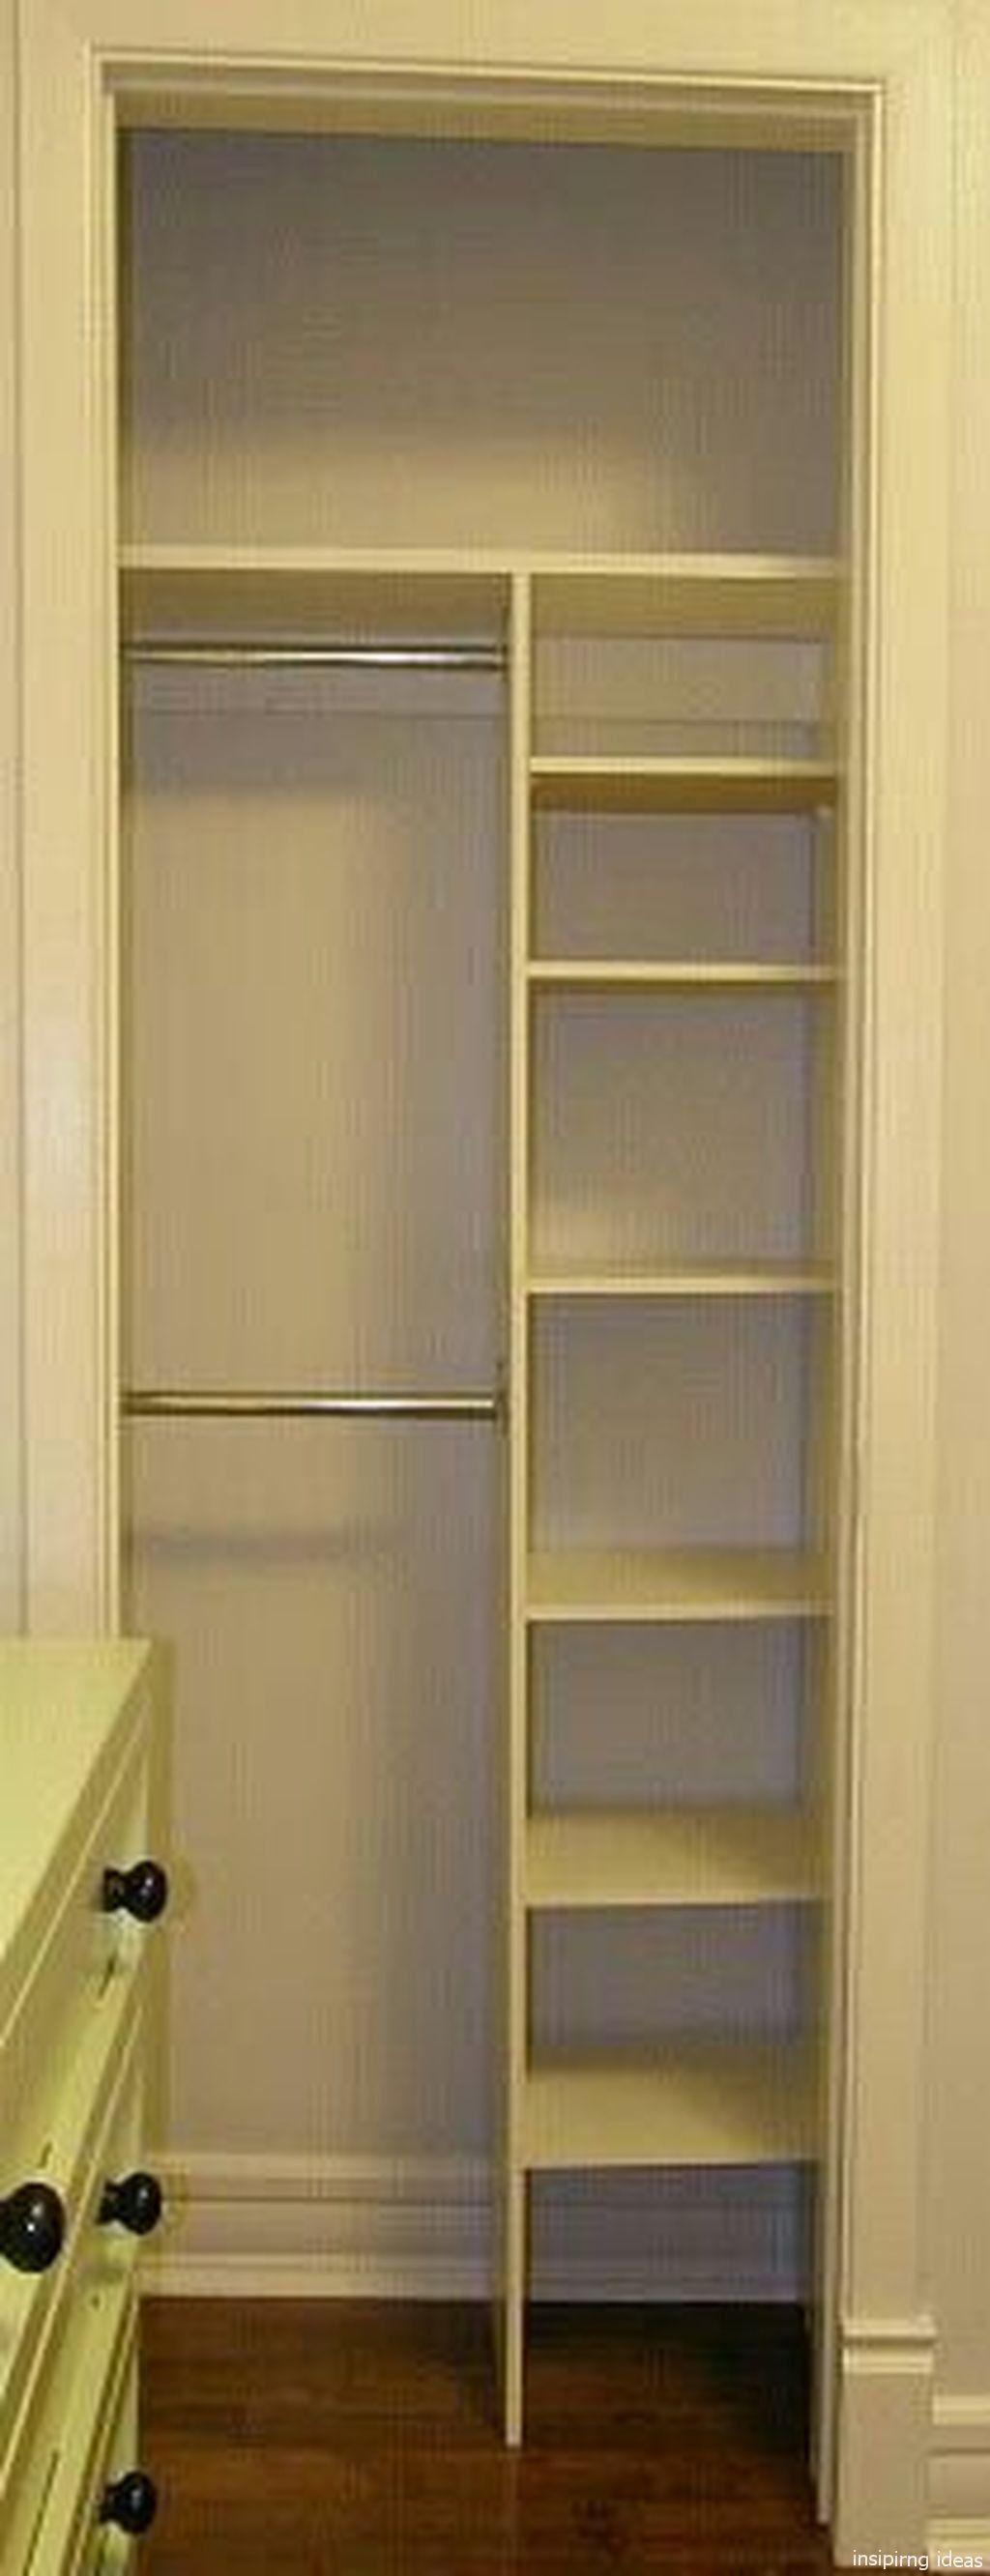 52 genius small closet ideas  bedroom organization closet